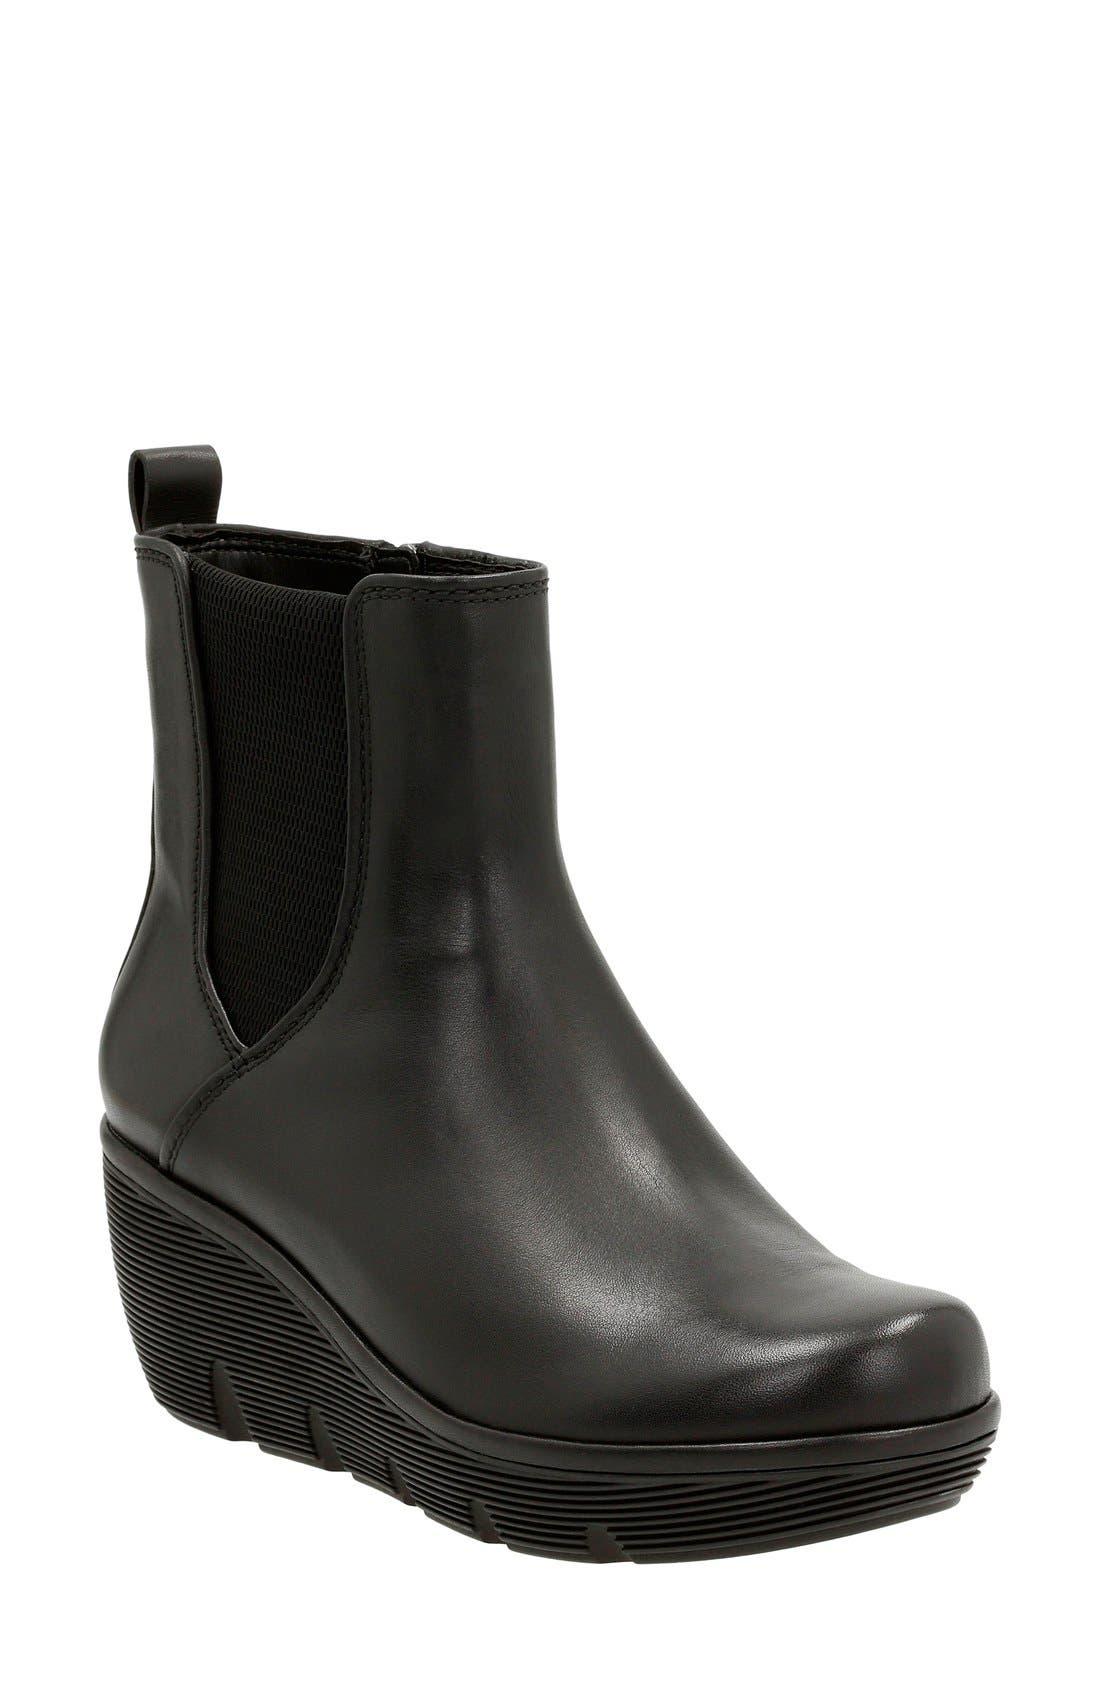 Main Image - Clarks® 'Clarene Surf' Wedge Chelsea Boot (Women)